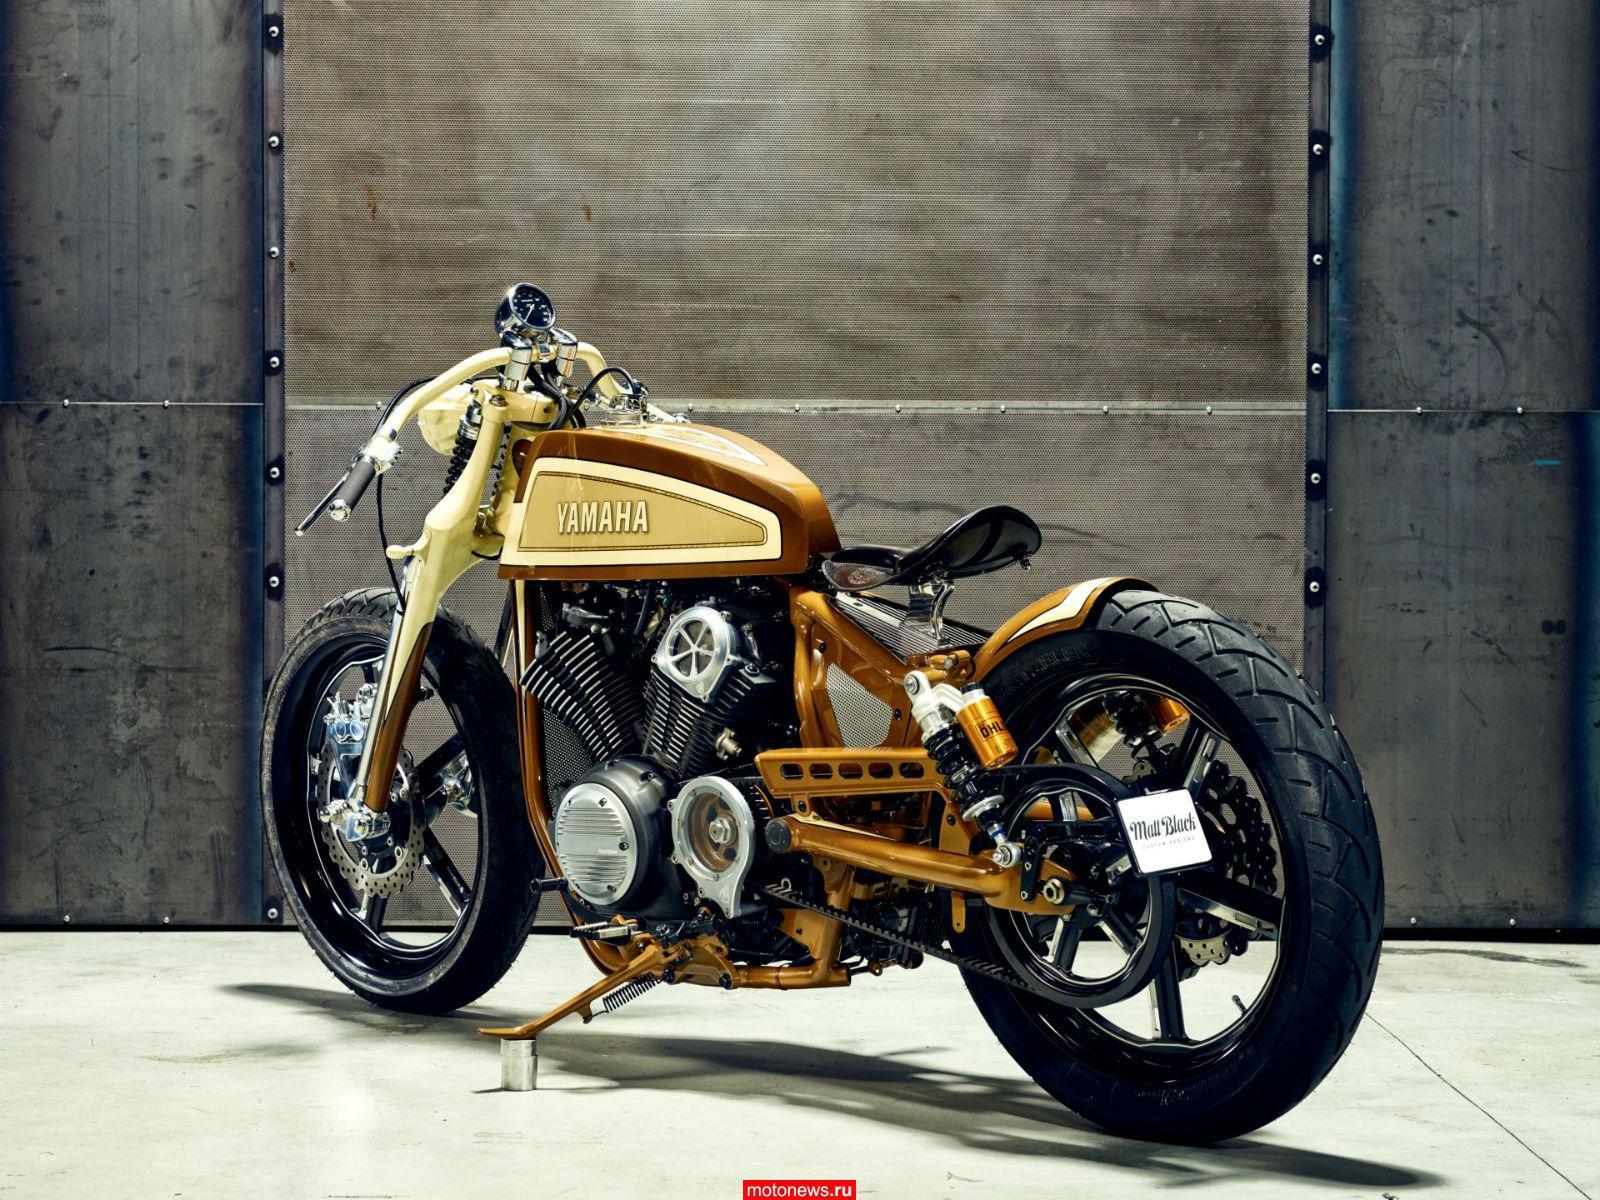 Кастом на базе Yamaha XV950 от Matt Black